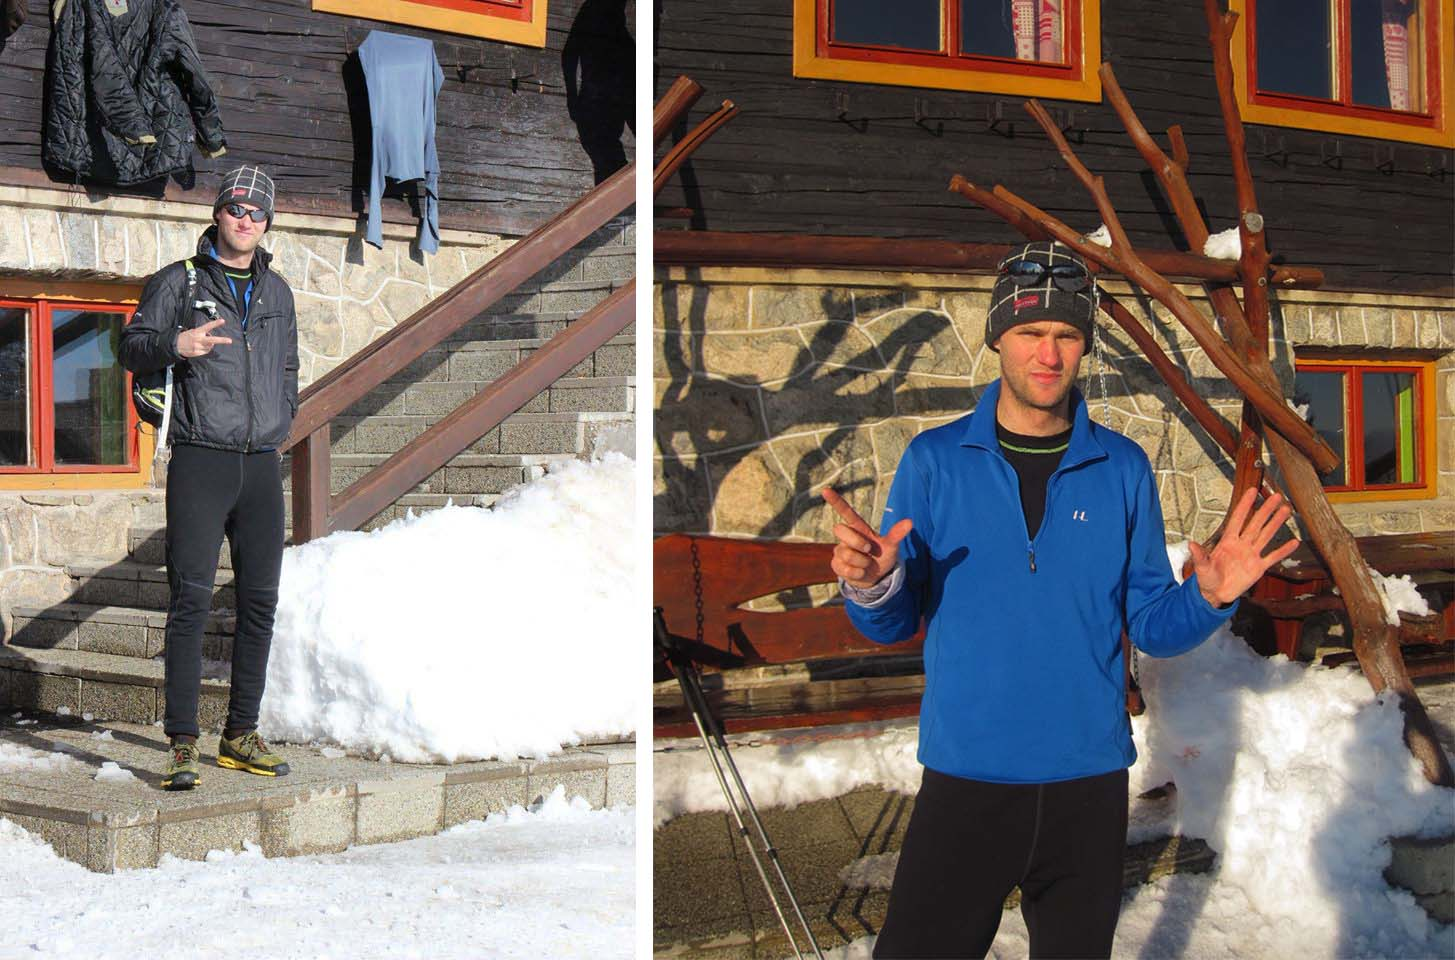 zajo alpine pants elasticke nohavice na zimu